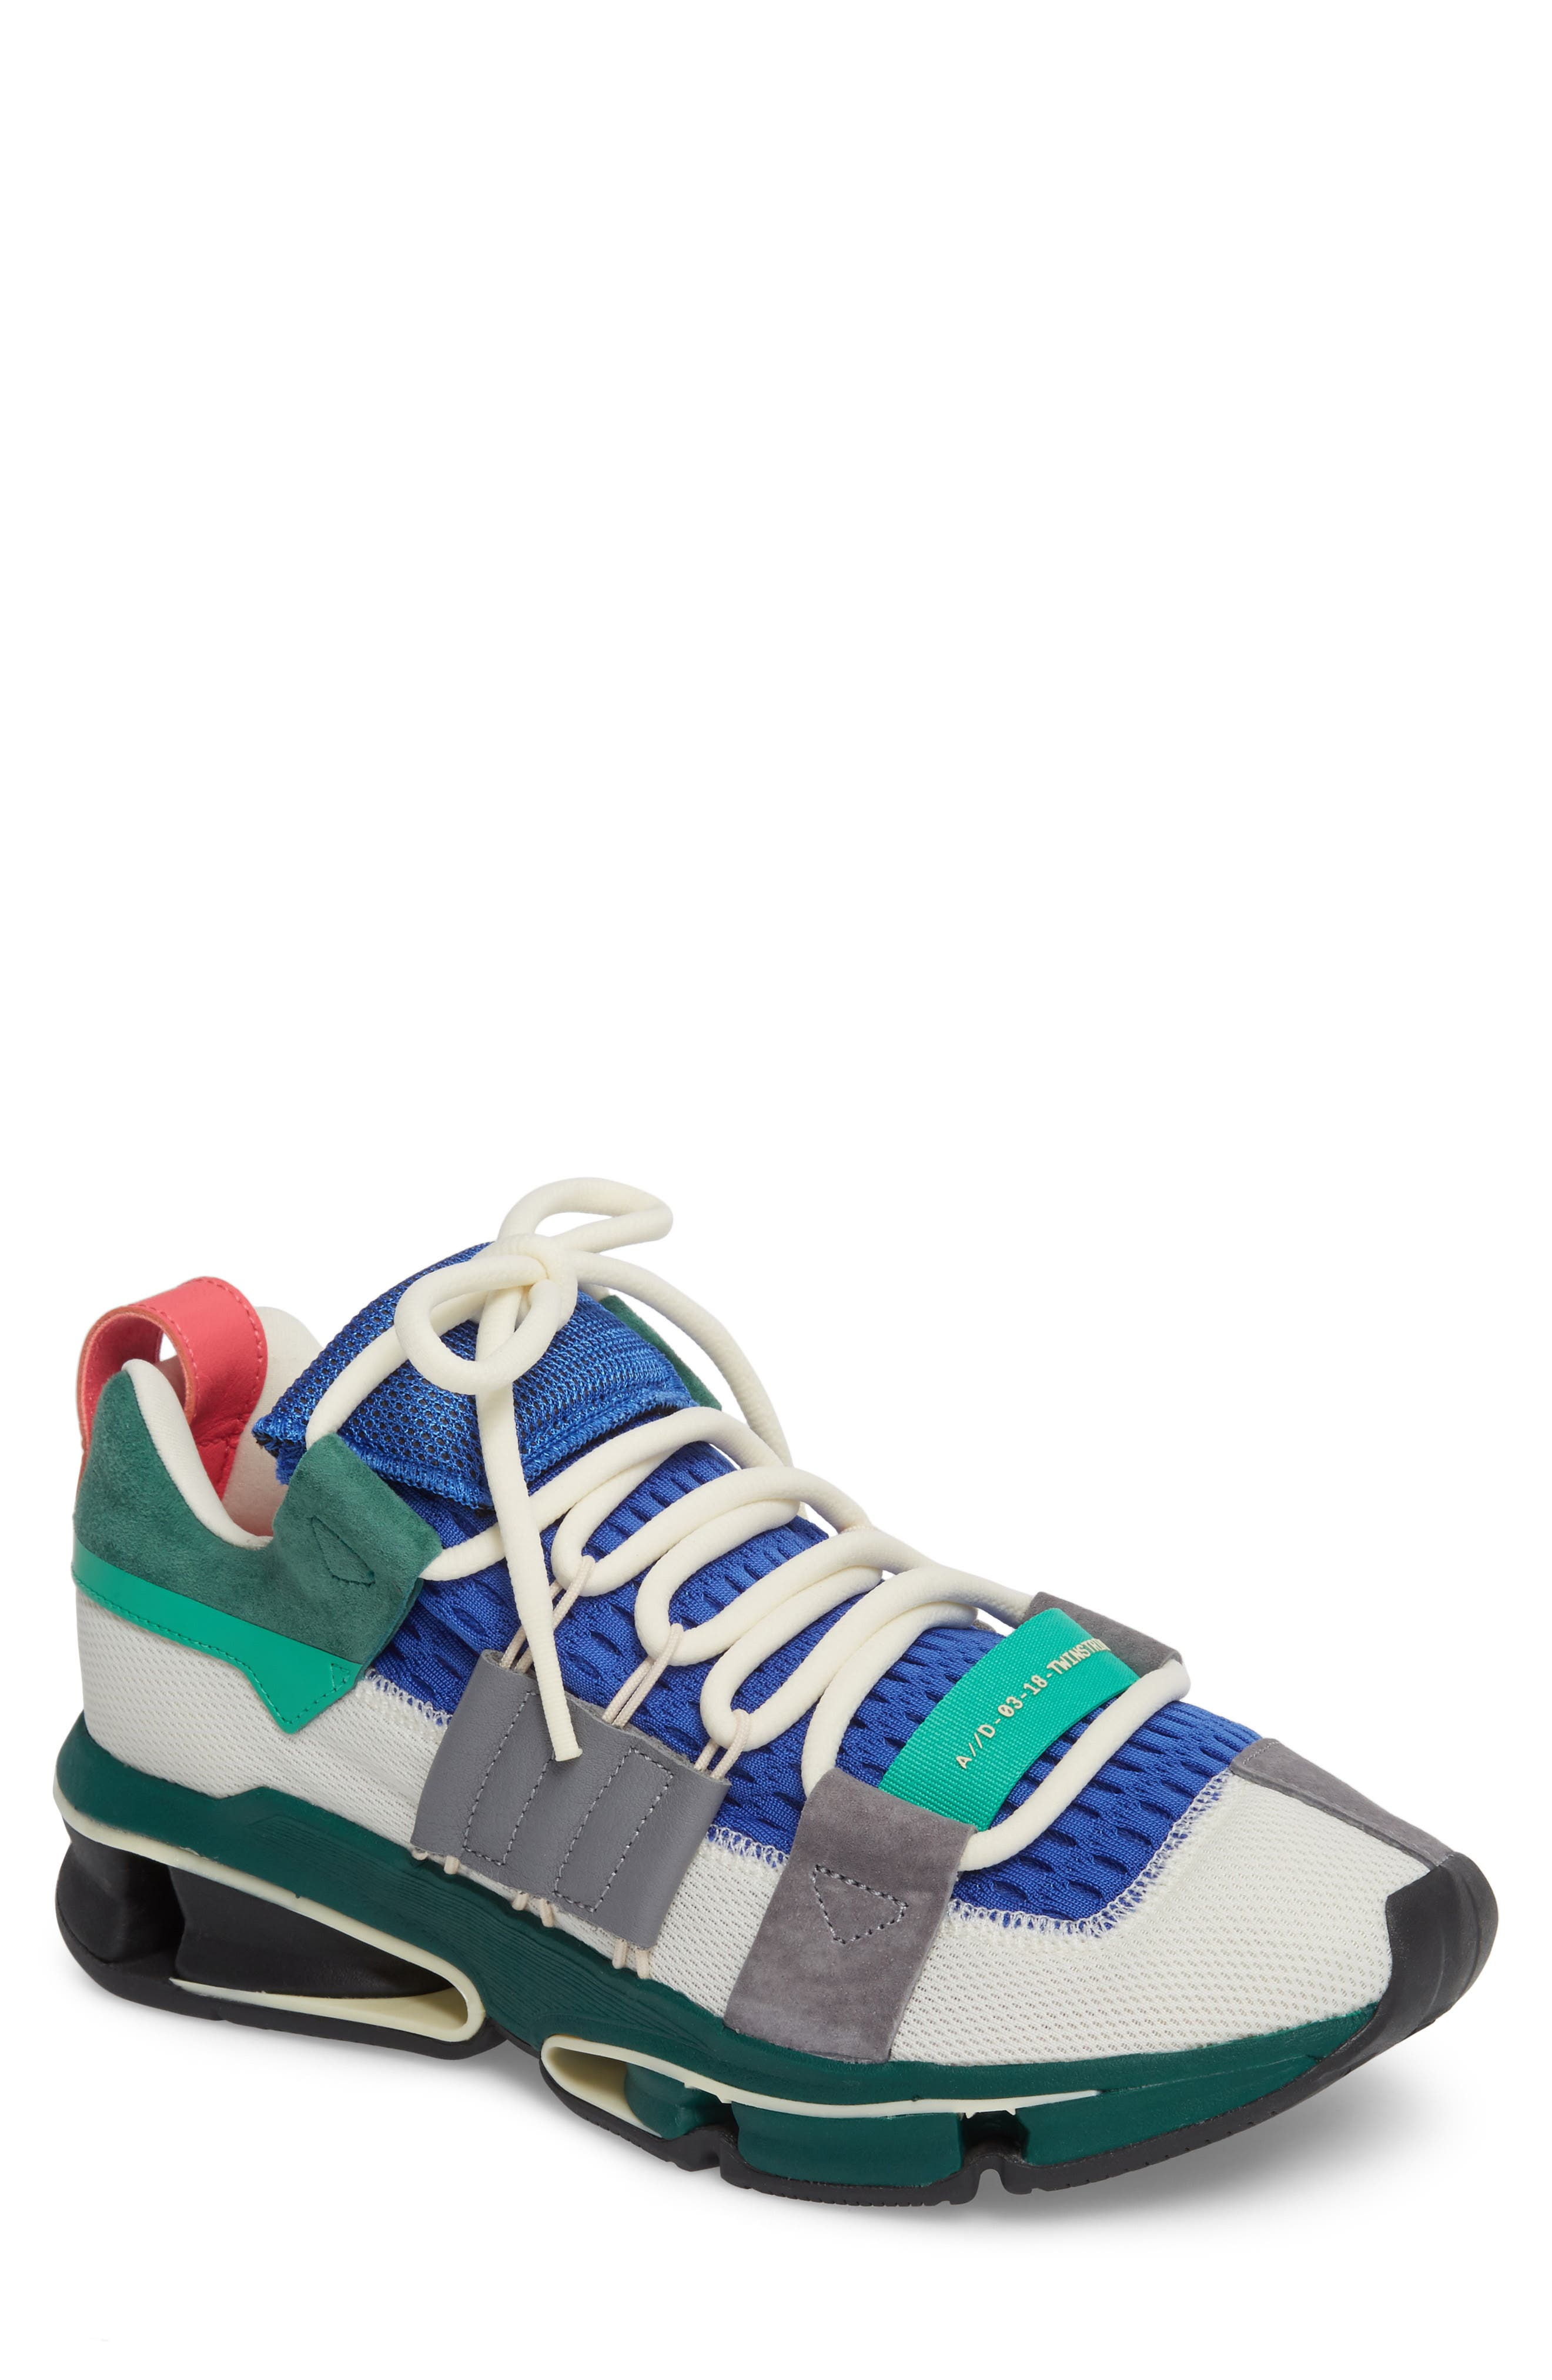 Twinstrike ADV Sneaker,                             Main thumbnail 1, color,                             400